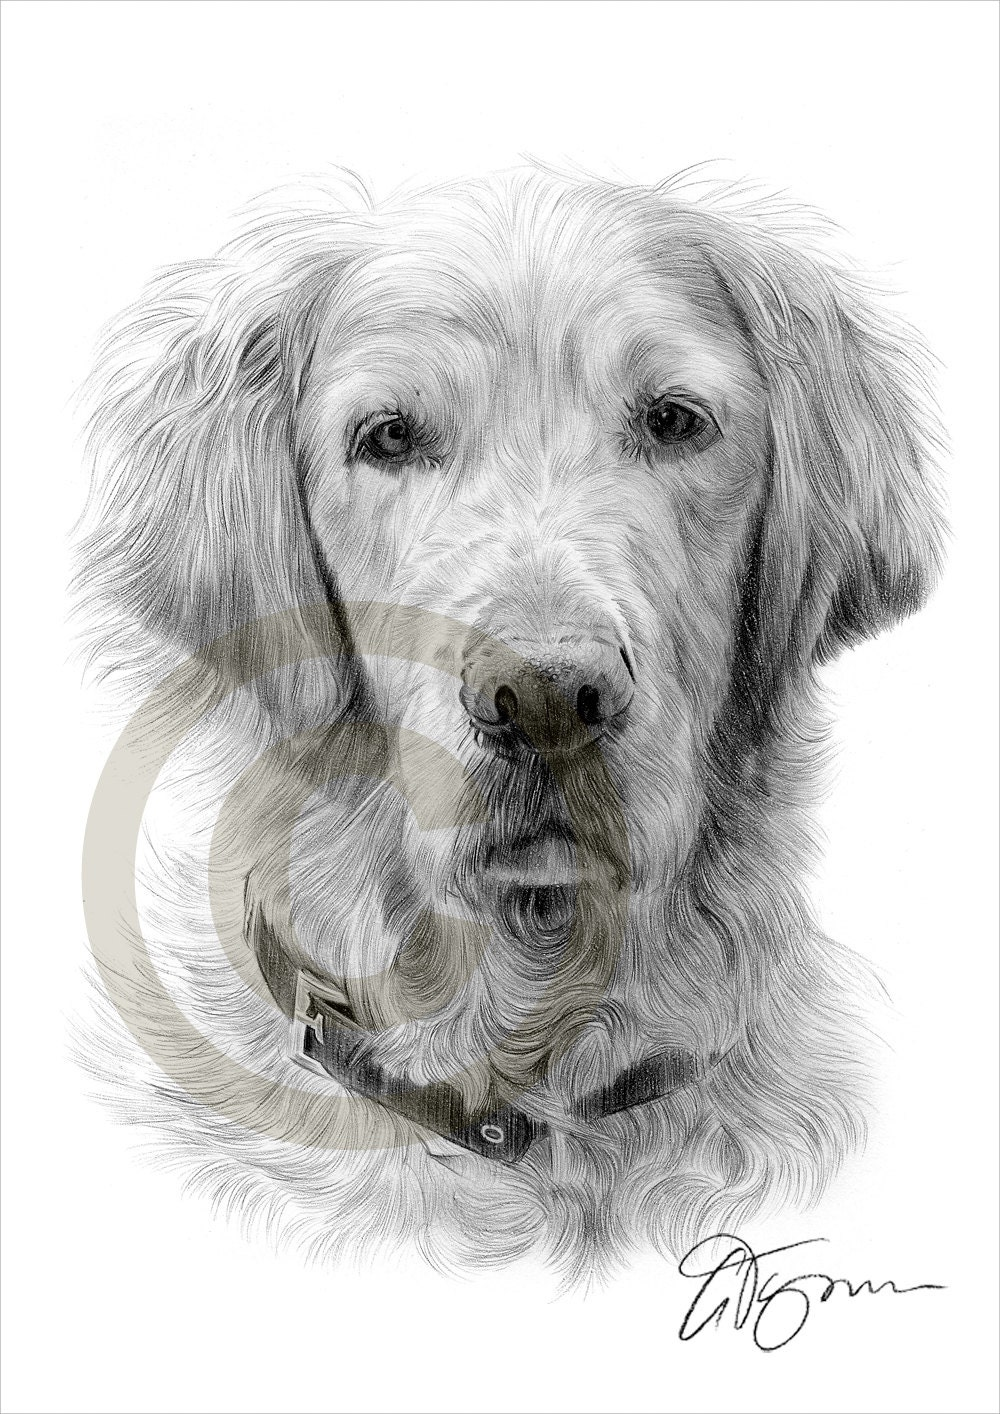 Dog golden retriever pencil drawing print a4 size artwork - Dessin golden retriever ...